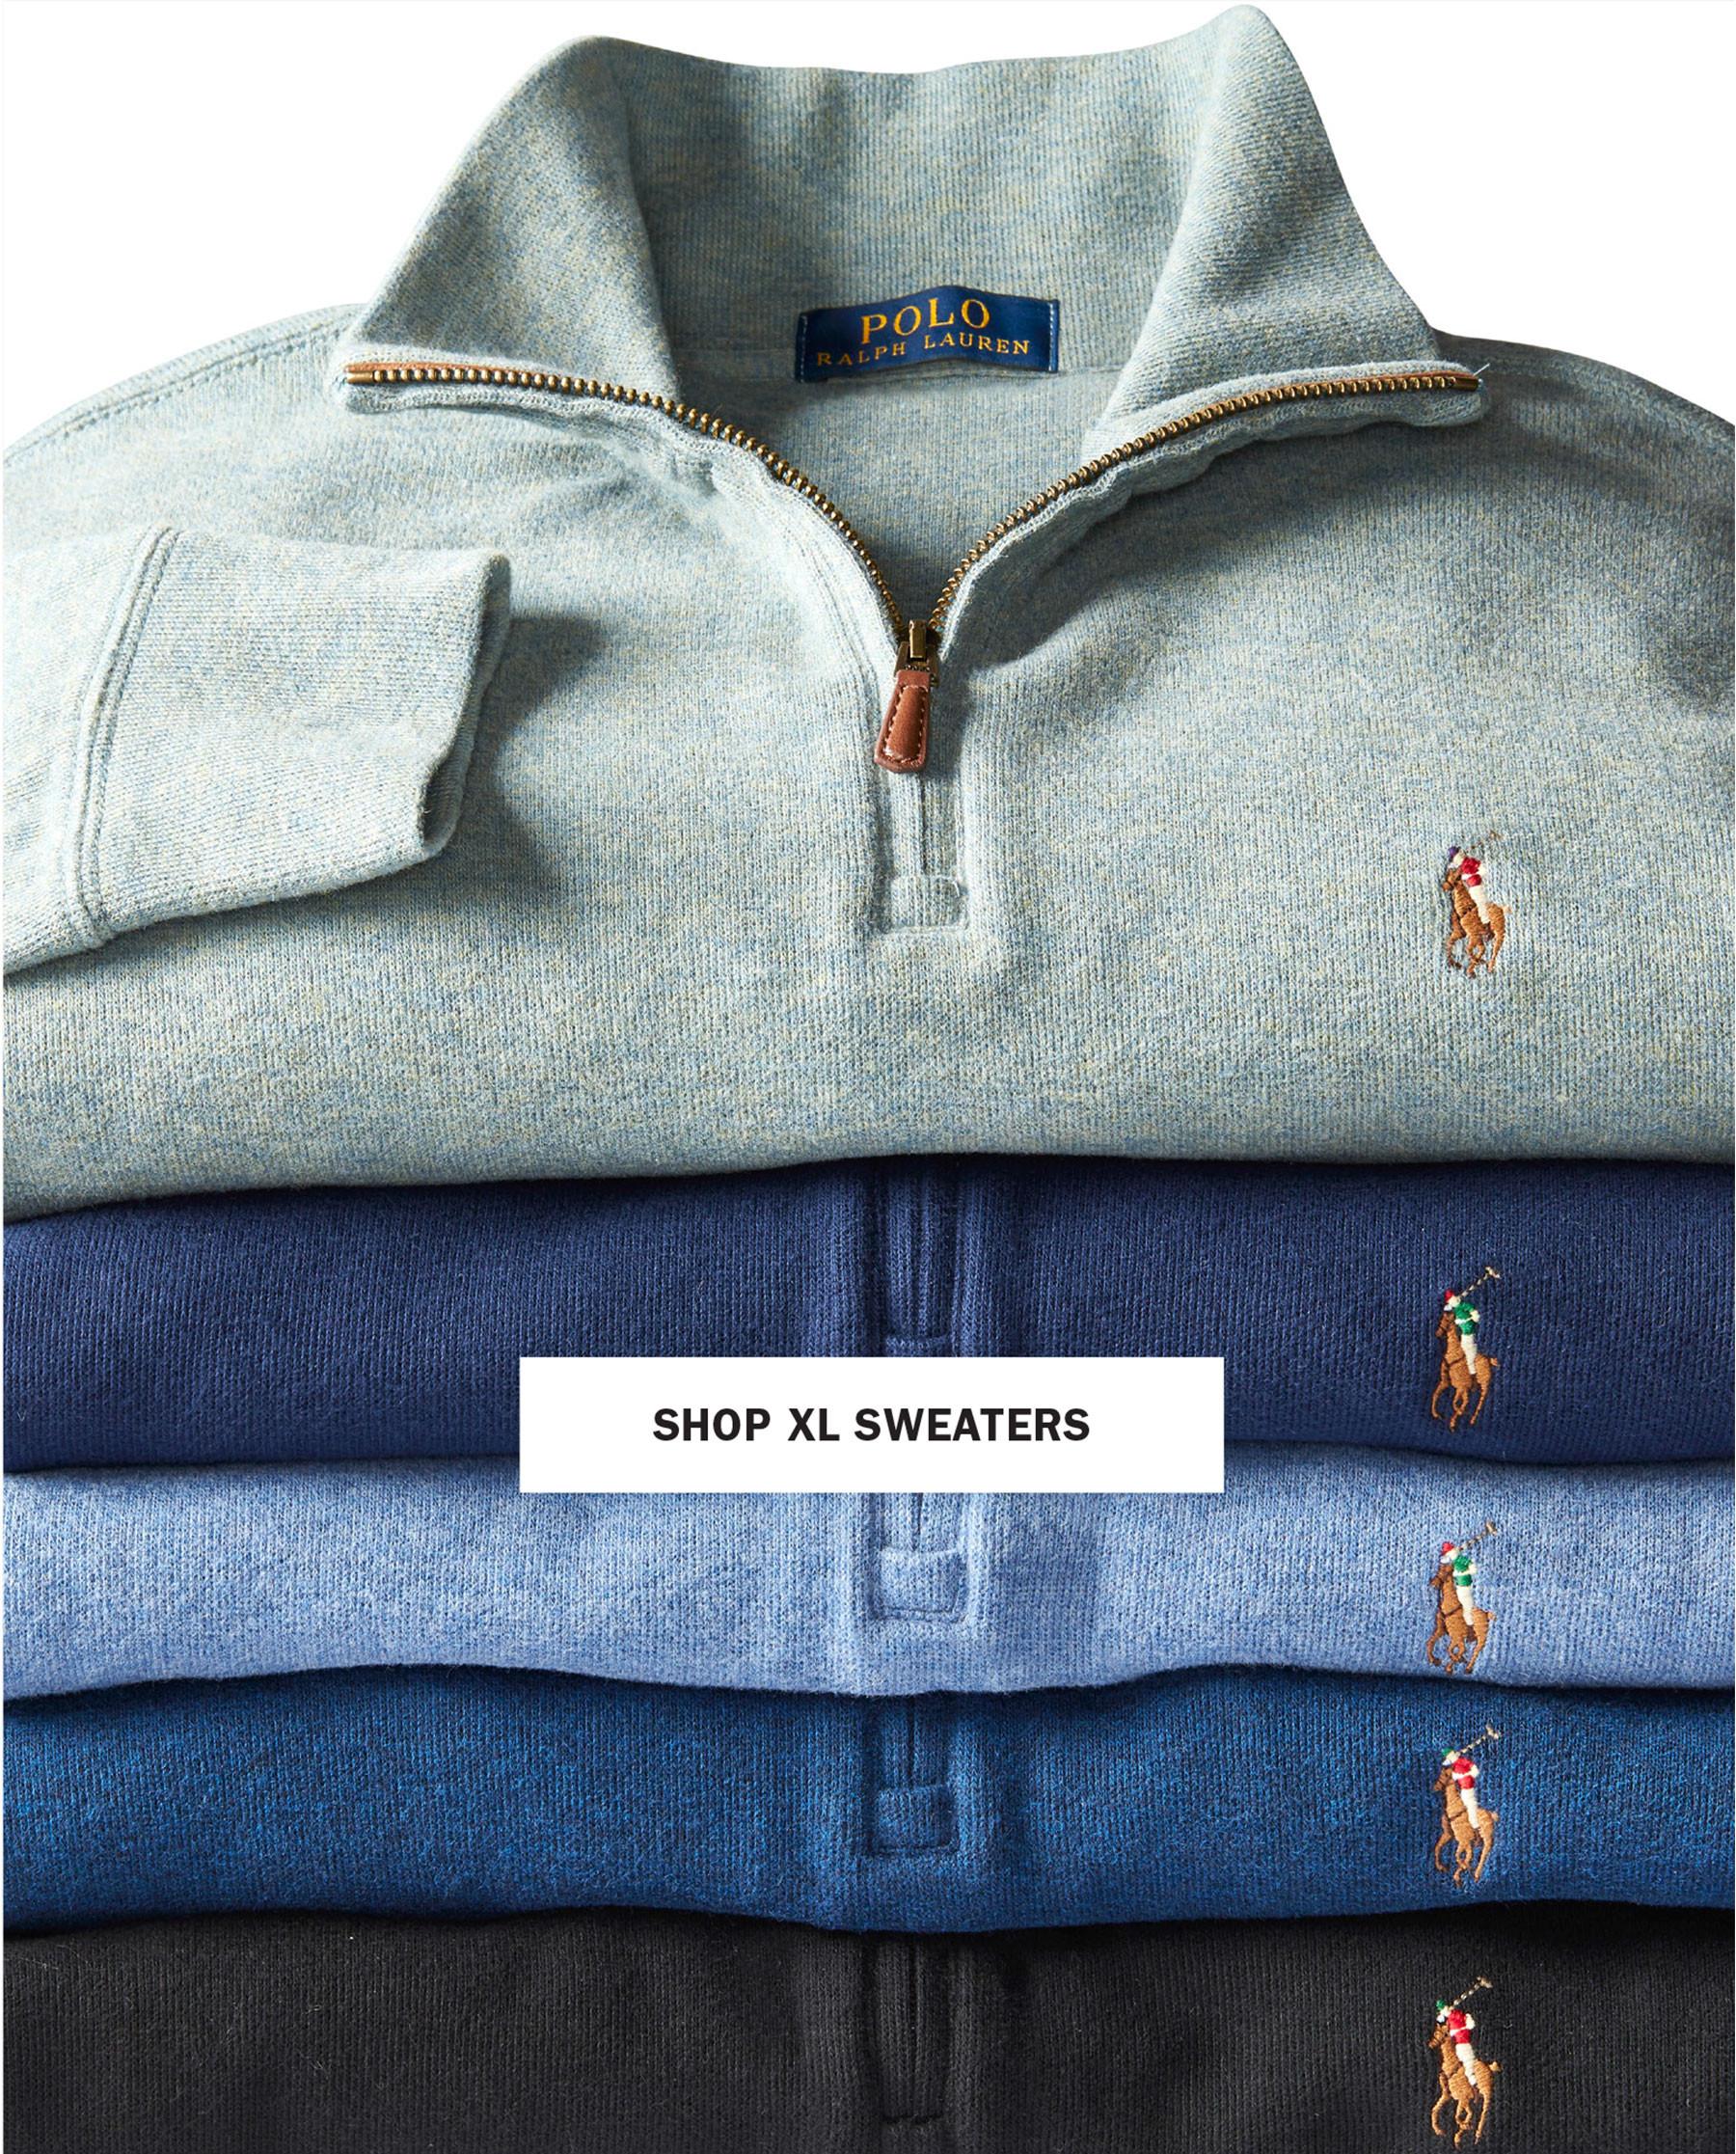 SHOP XL Sweaters